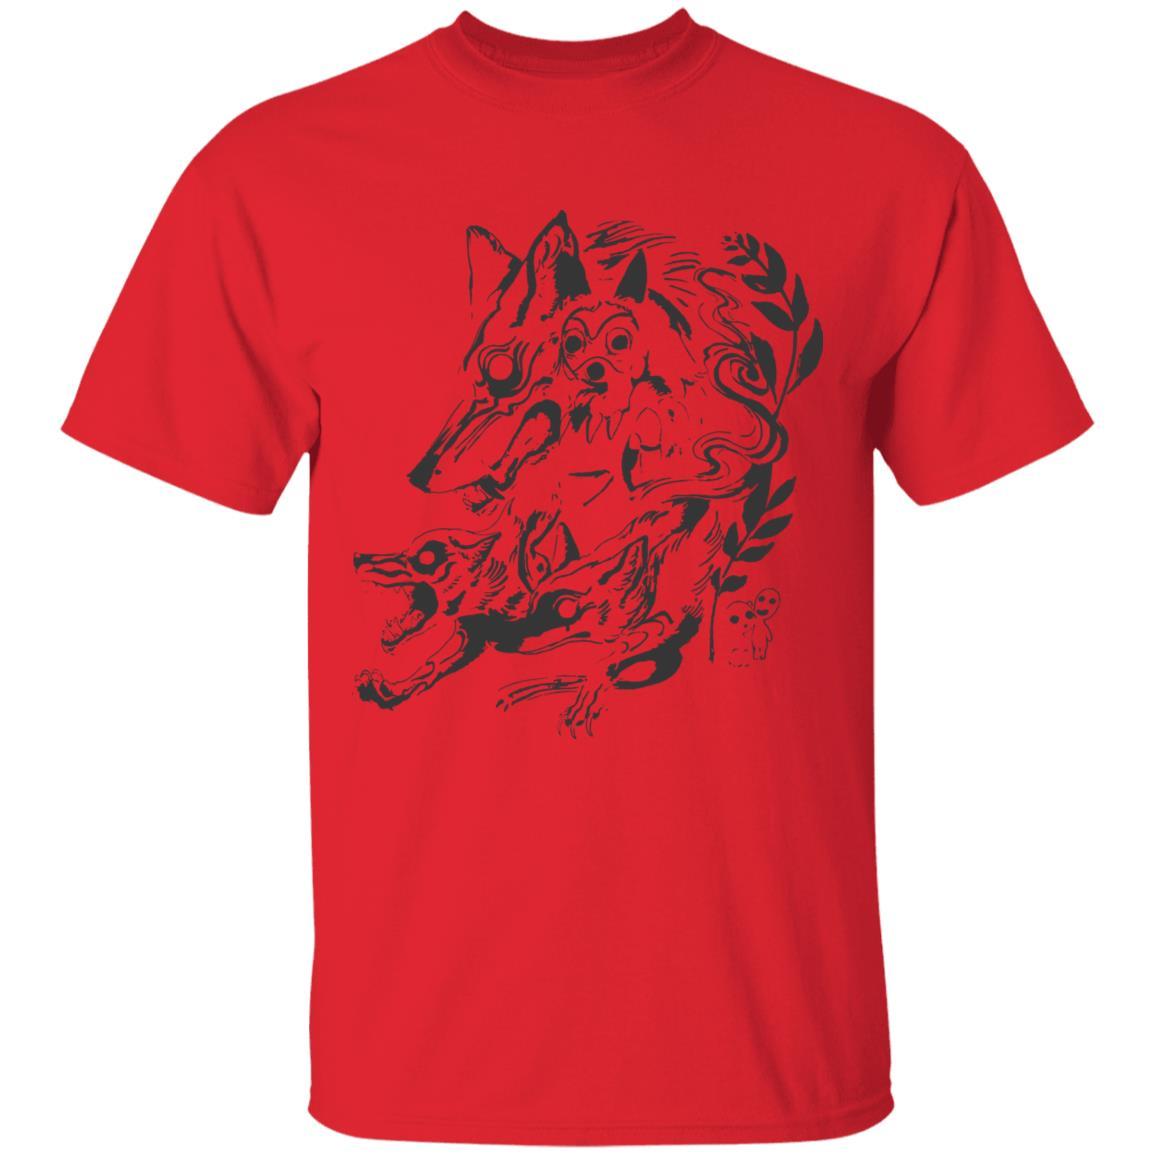 Princess Mononoke and The Wolf Creative Art T Shirt Unisex